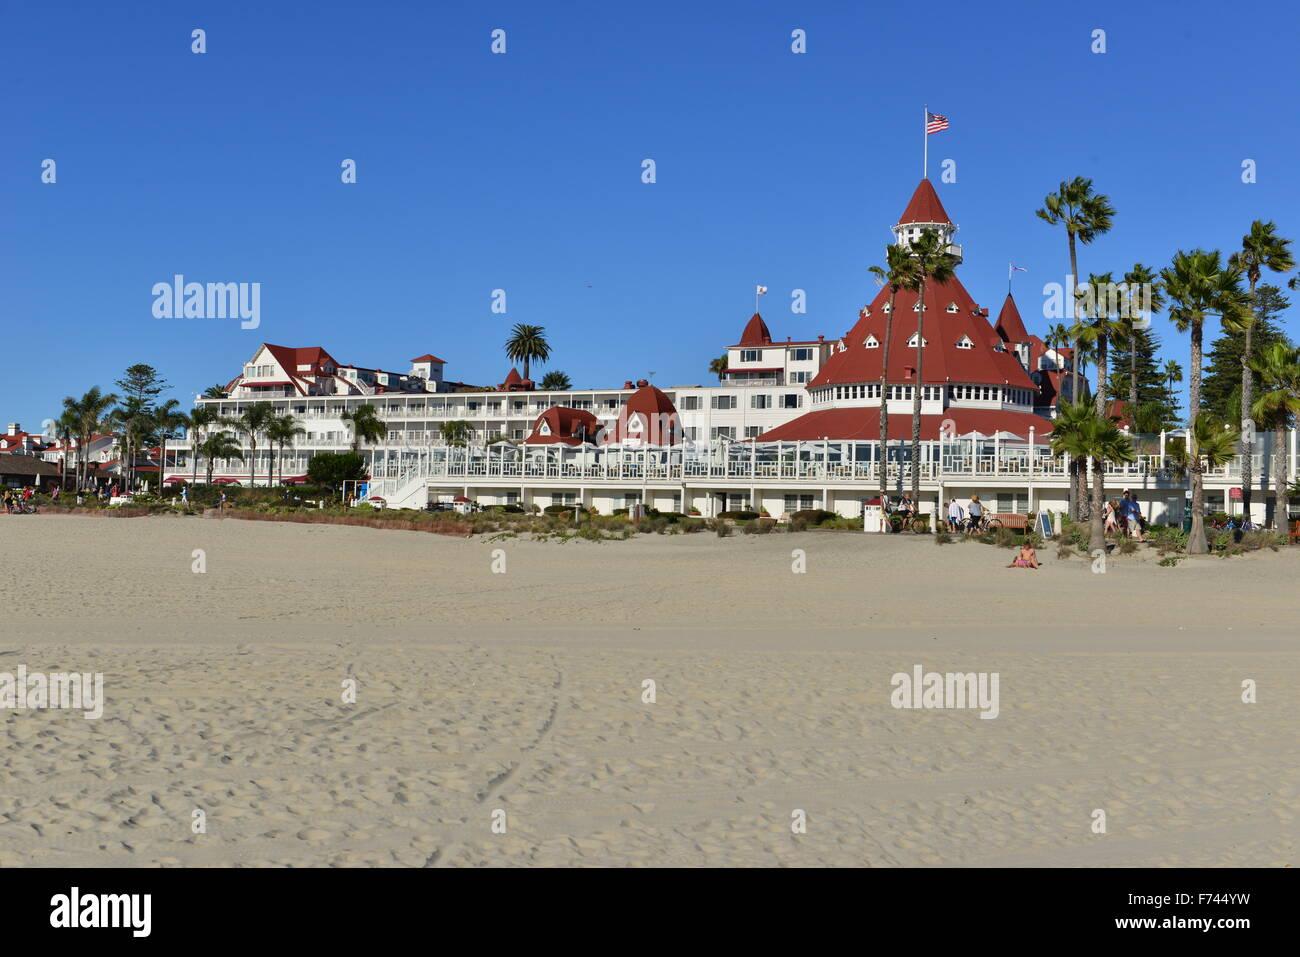 Hotel del Coronado  beach front hotel in the city of Coronado, Stock Photo